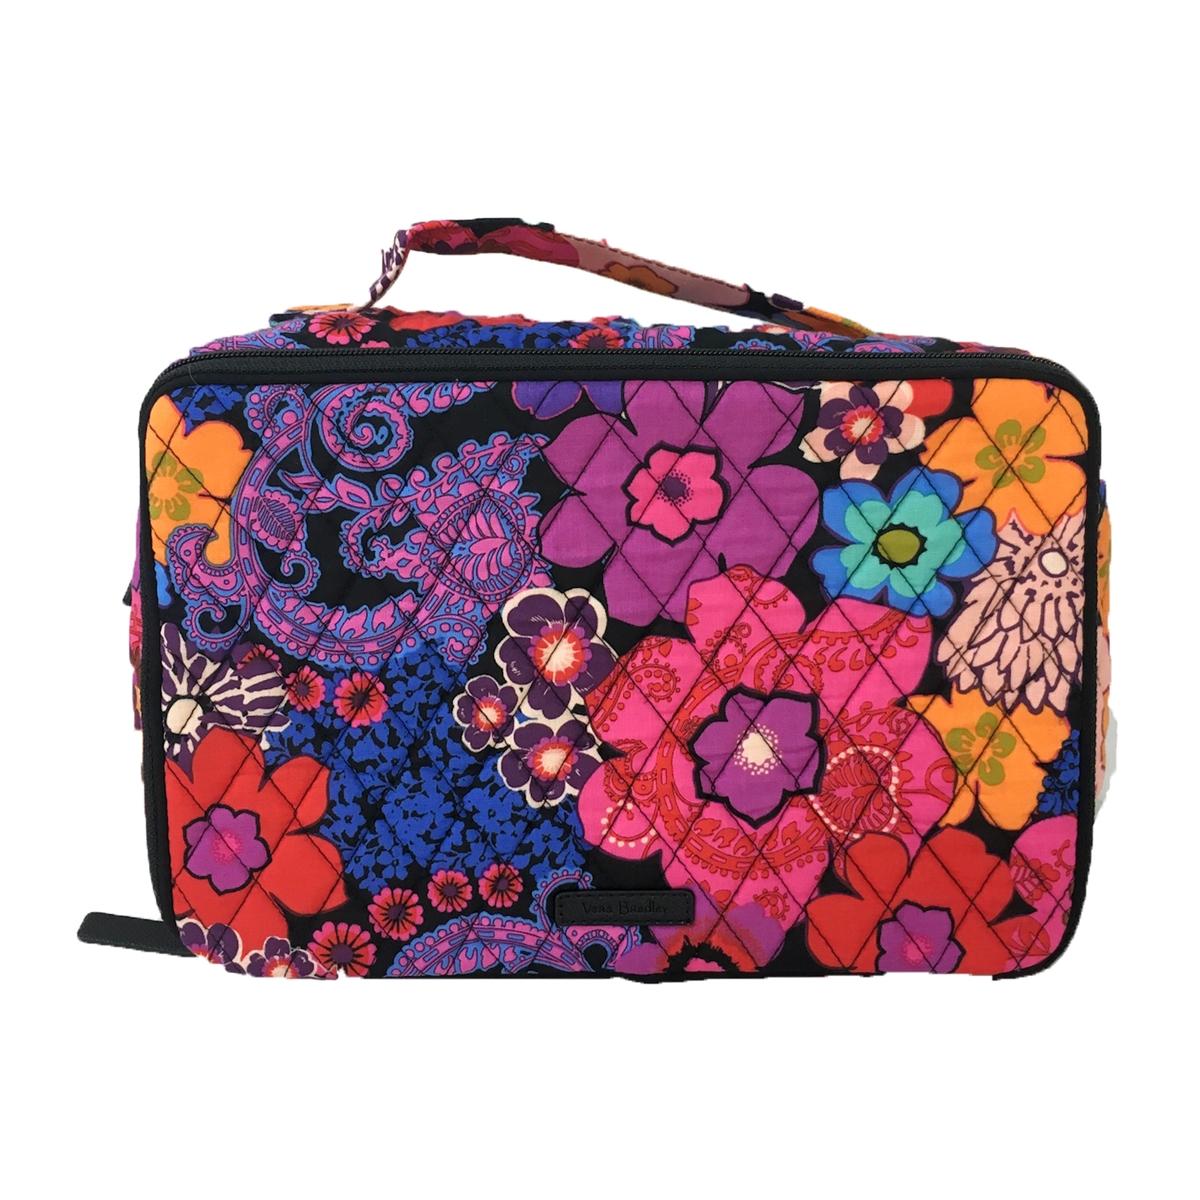 3023793c1239 Vera Bradley Iconic Large Blush and Brush Makeup Case